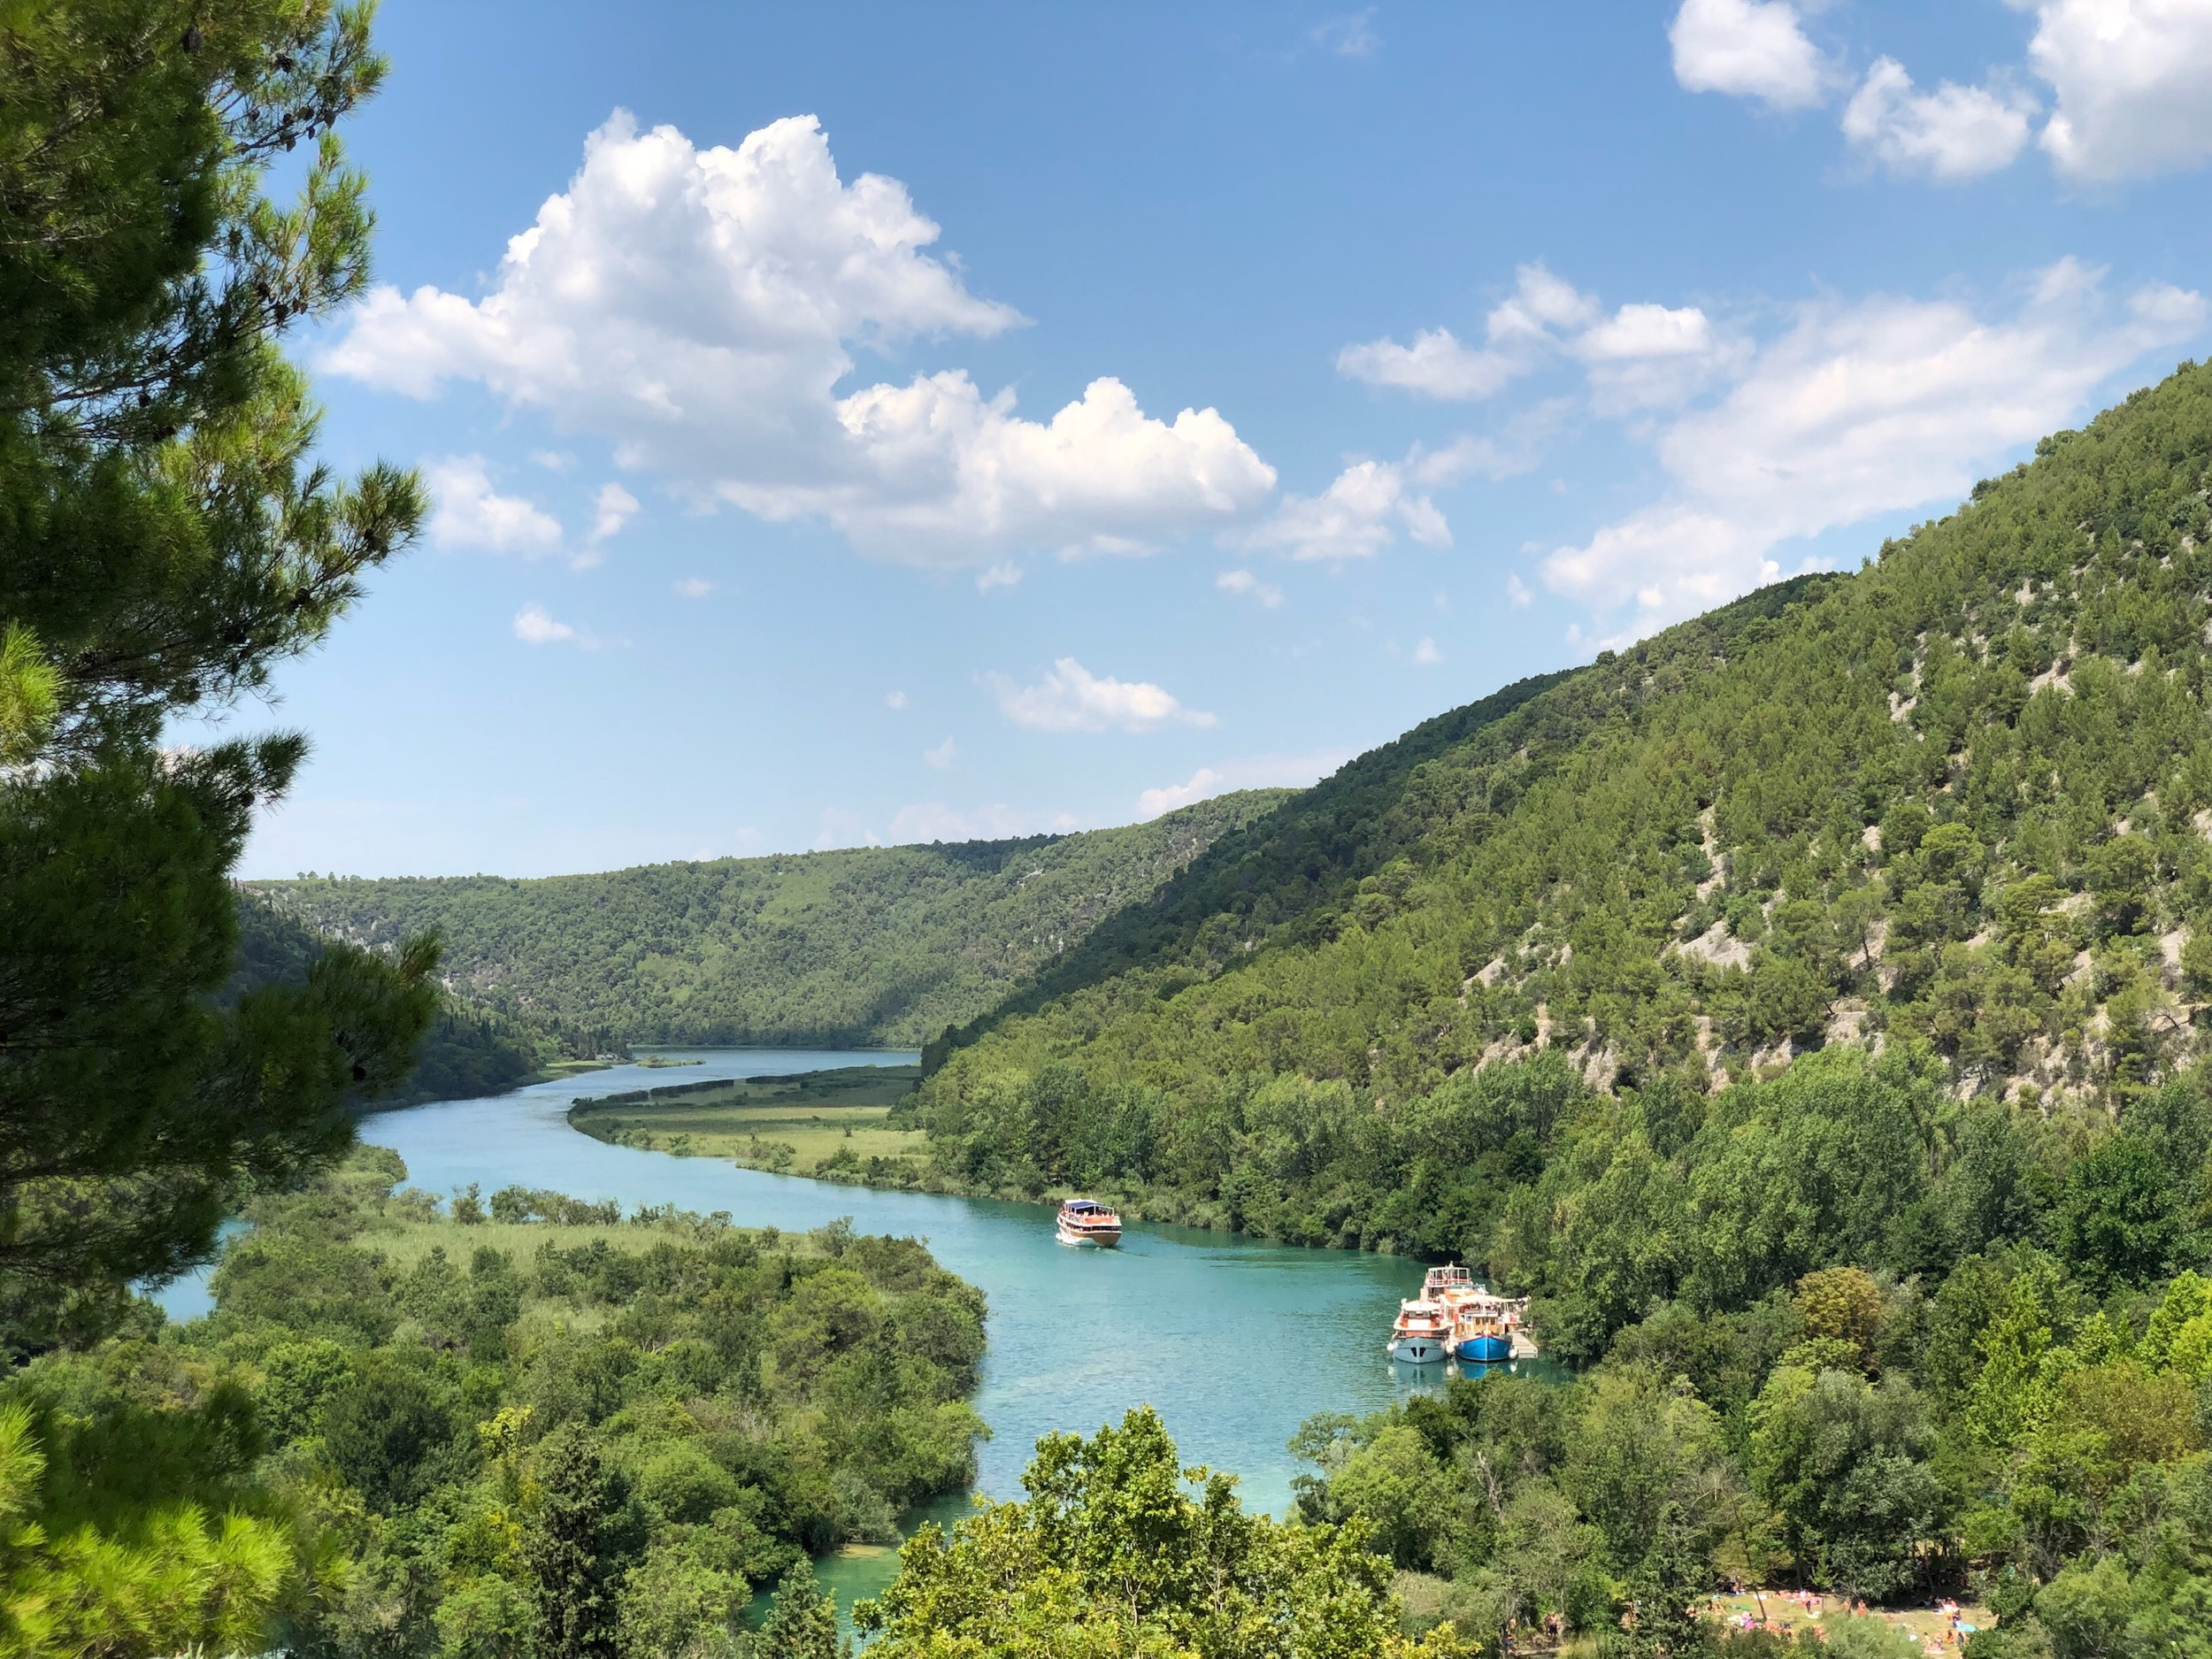 krka national park by ross farley.jpg